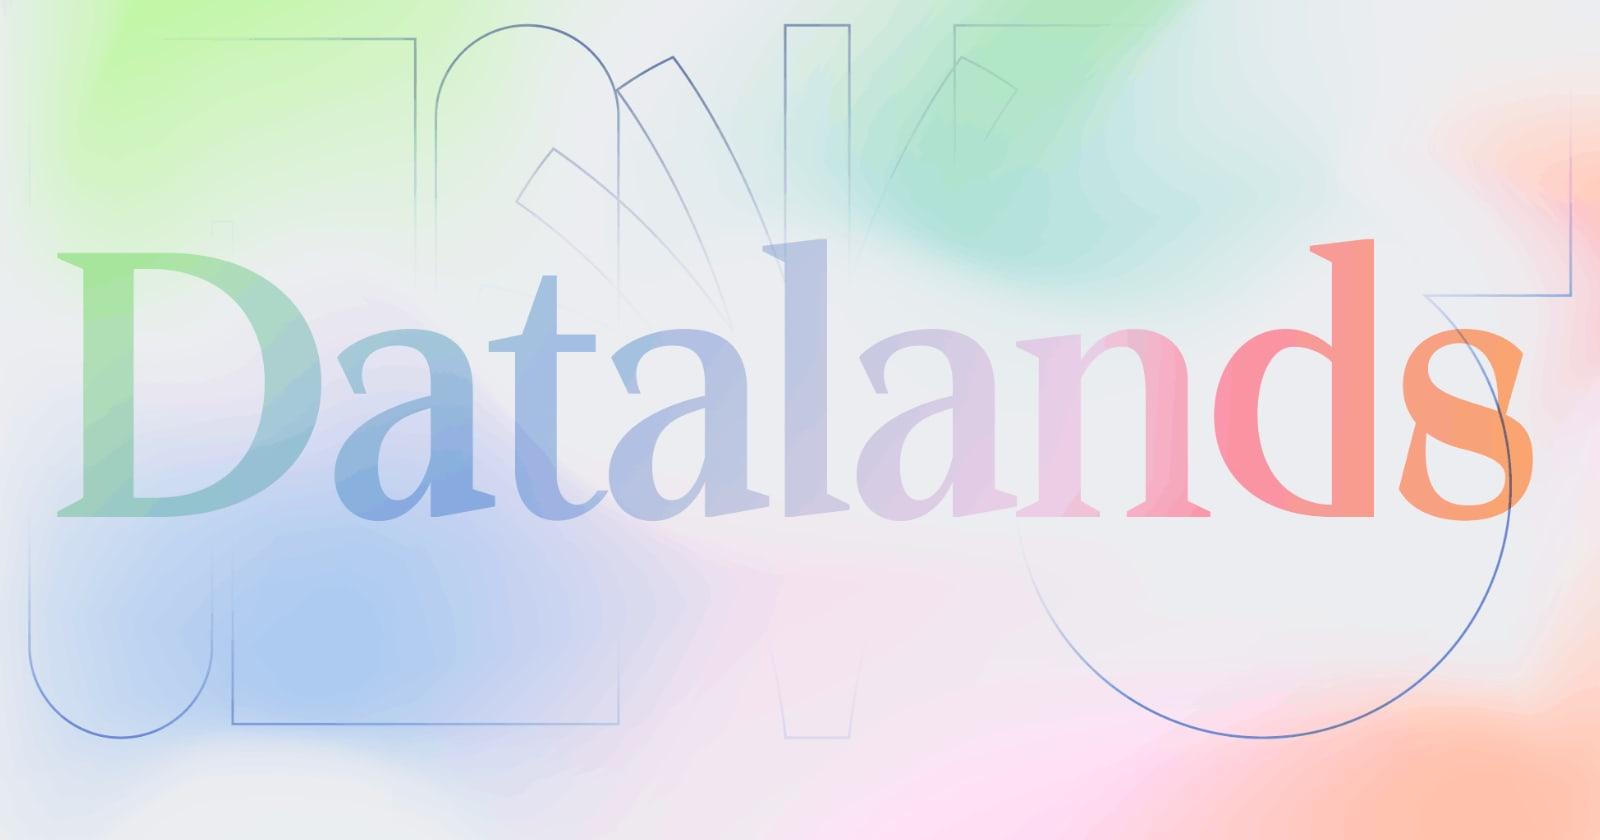 Datalands